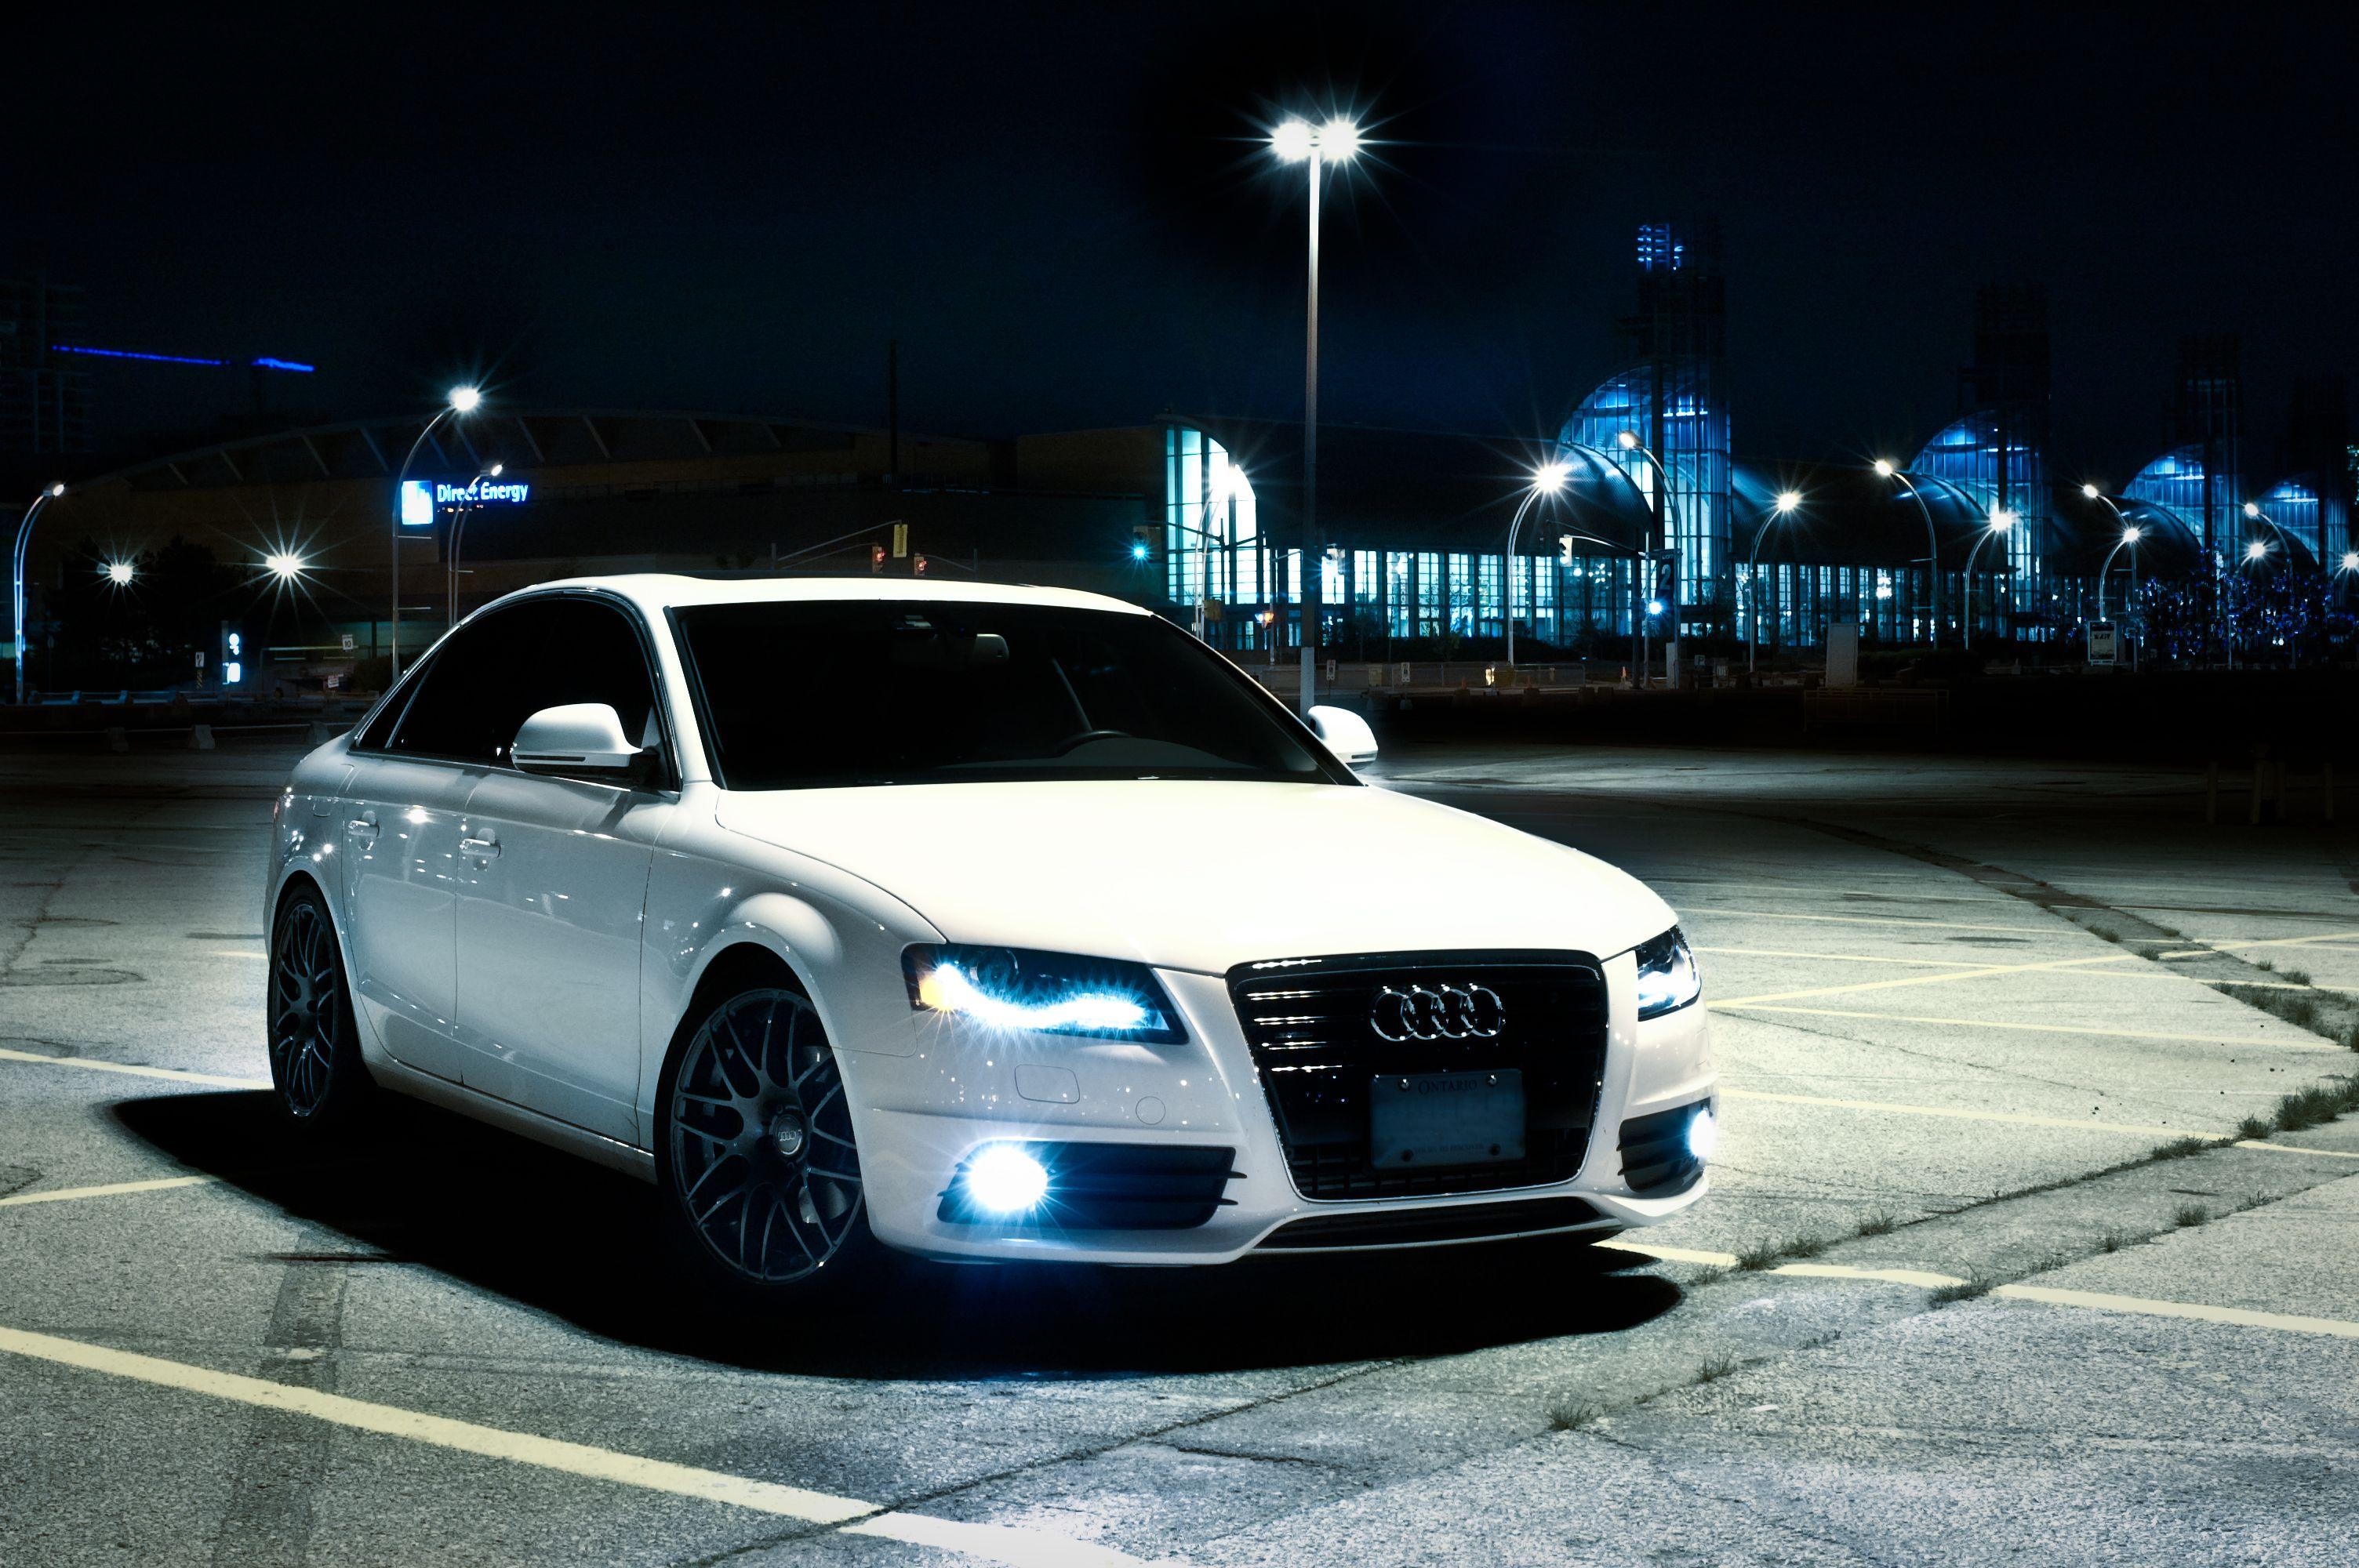 Audi A Images For Free Wallpaper Tetkó Pinterest - Audi car lot